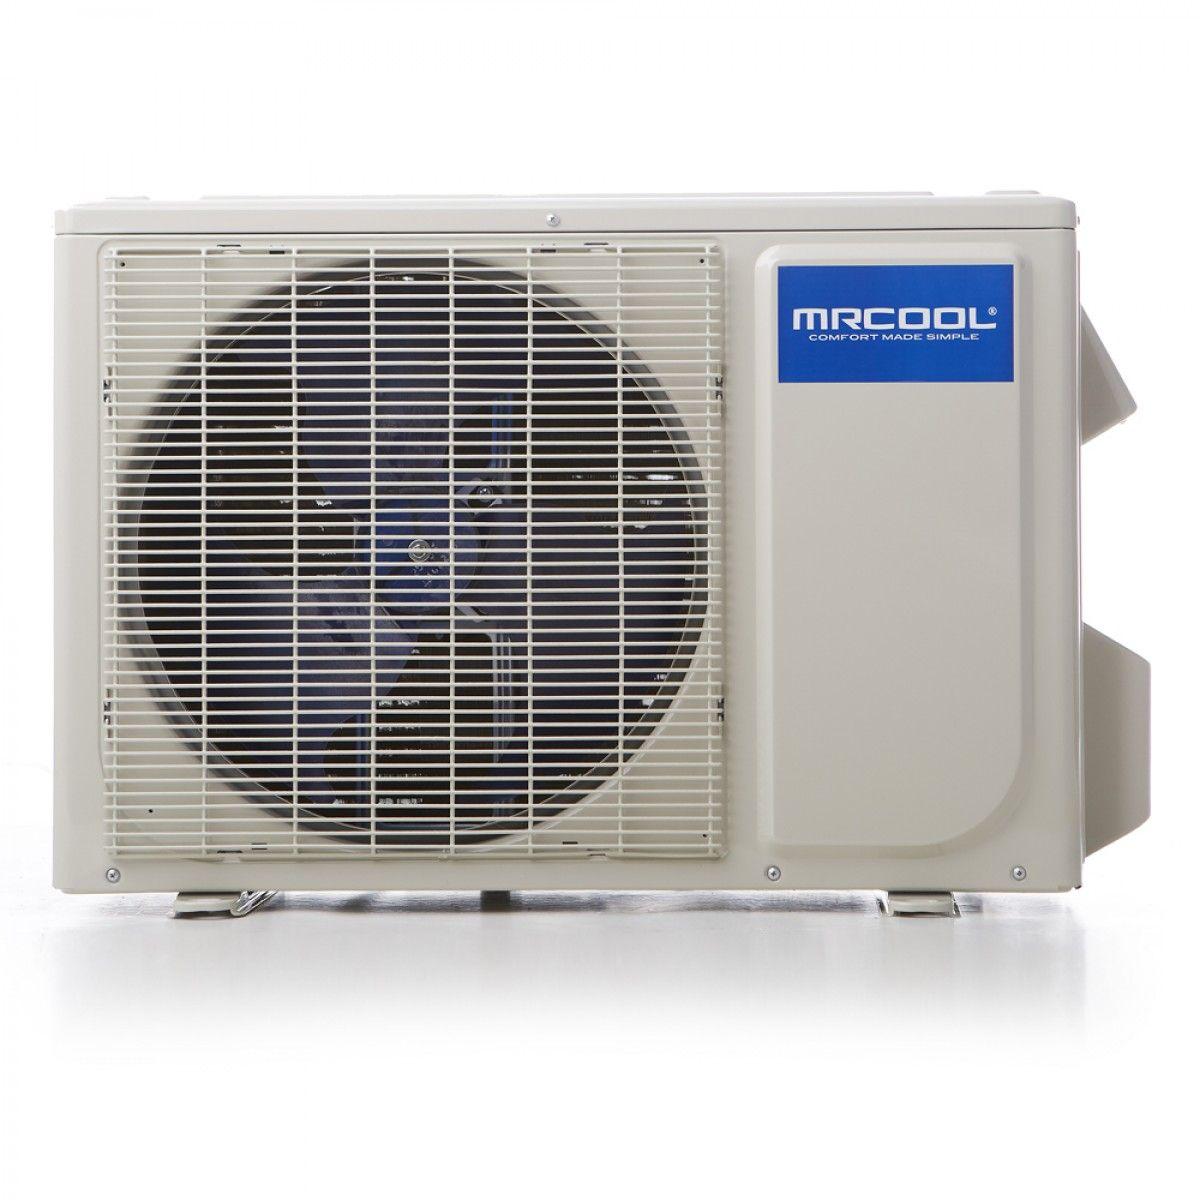 Mrcool Do It Yourself 24k Btu 16 Seer Heat Pump System 208